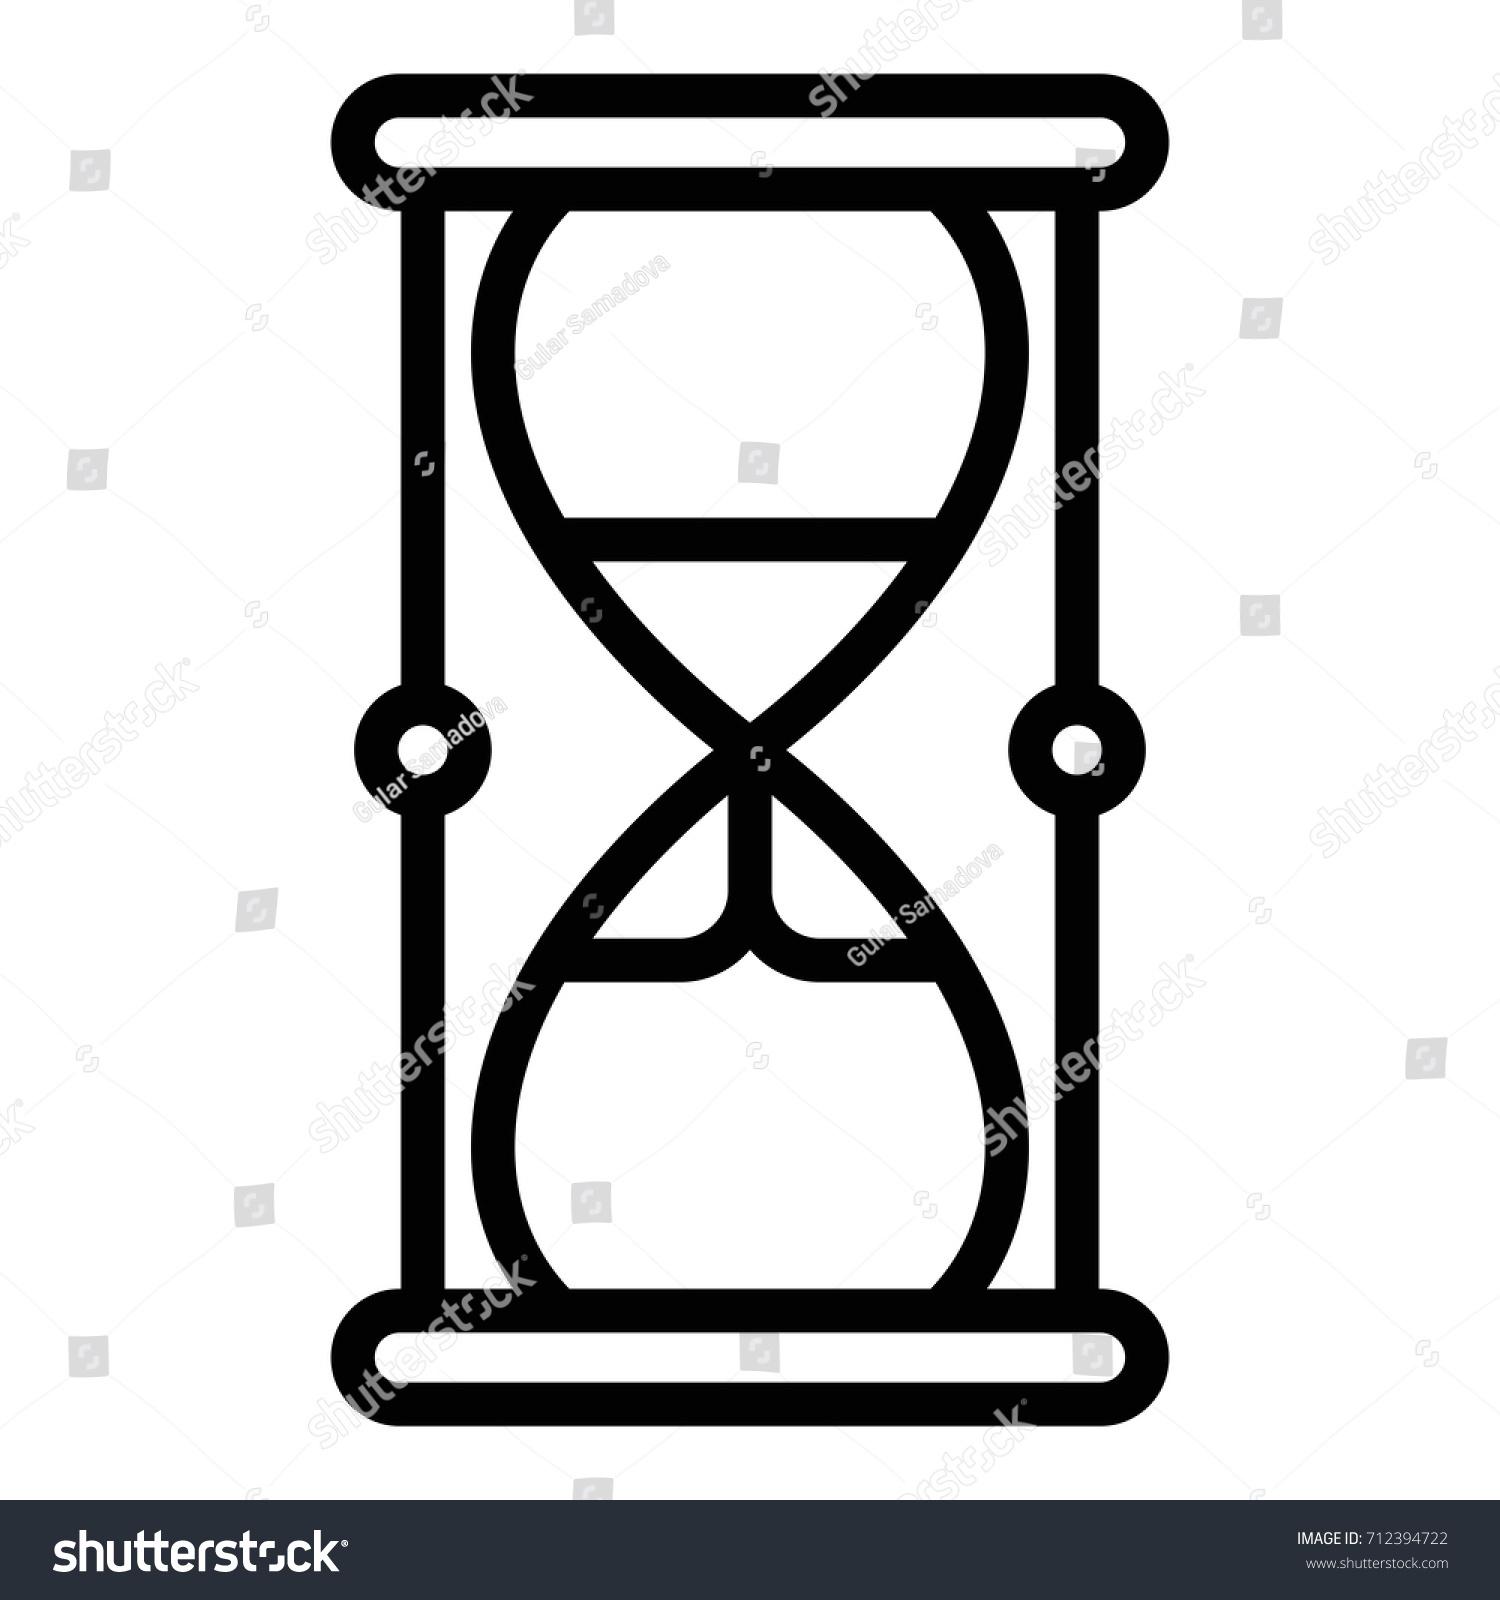 Hourglass symbol stock vector 712394722 shutterstock hourglass symbol biocorpaavc Images